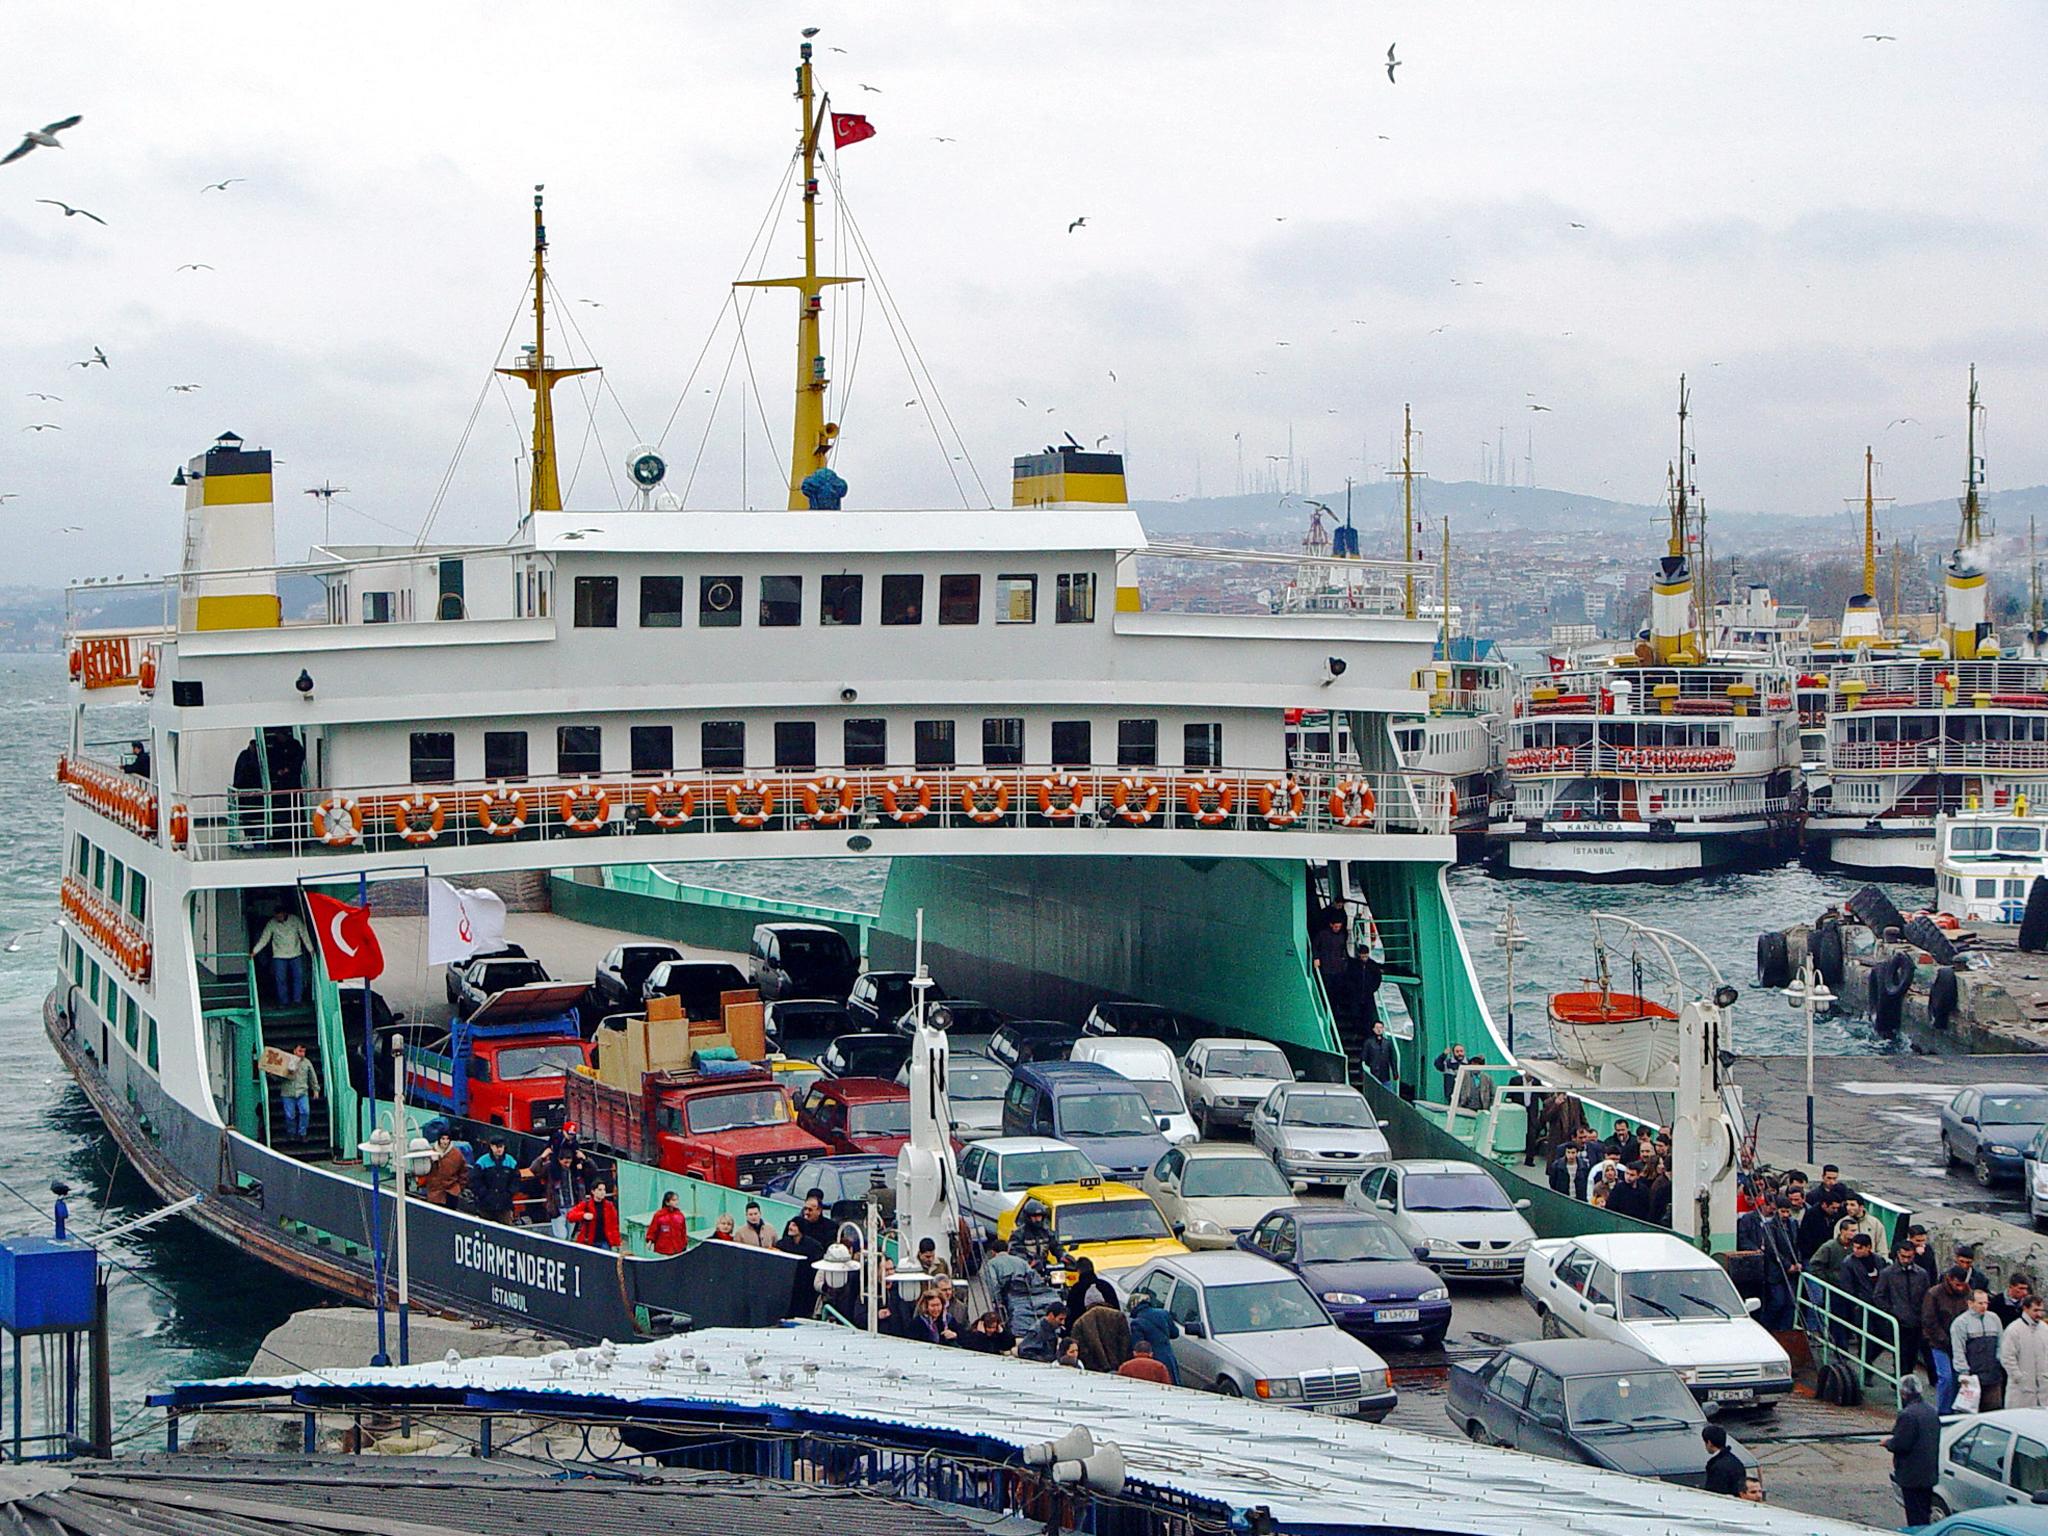 File:IstanbulFerry.jpg - Wikipedia